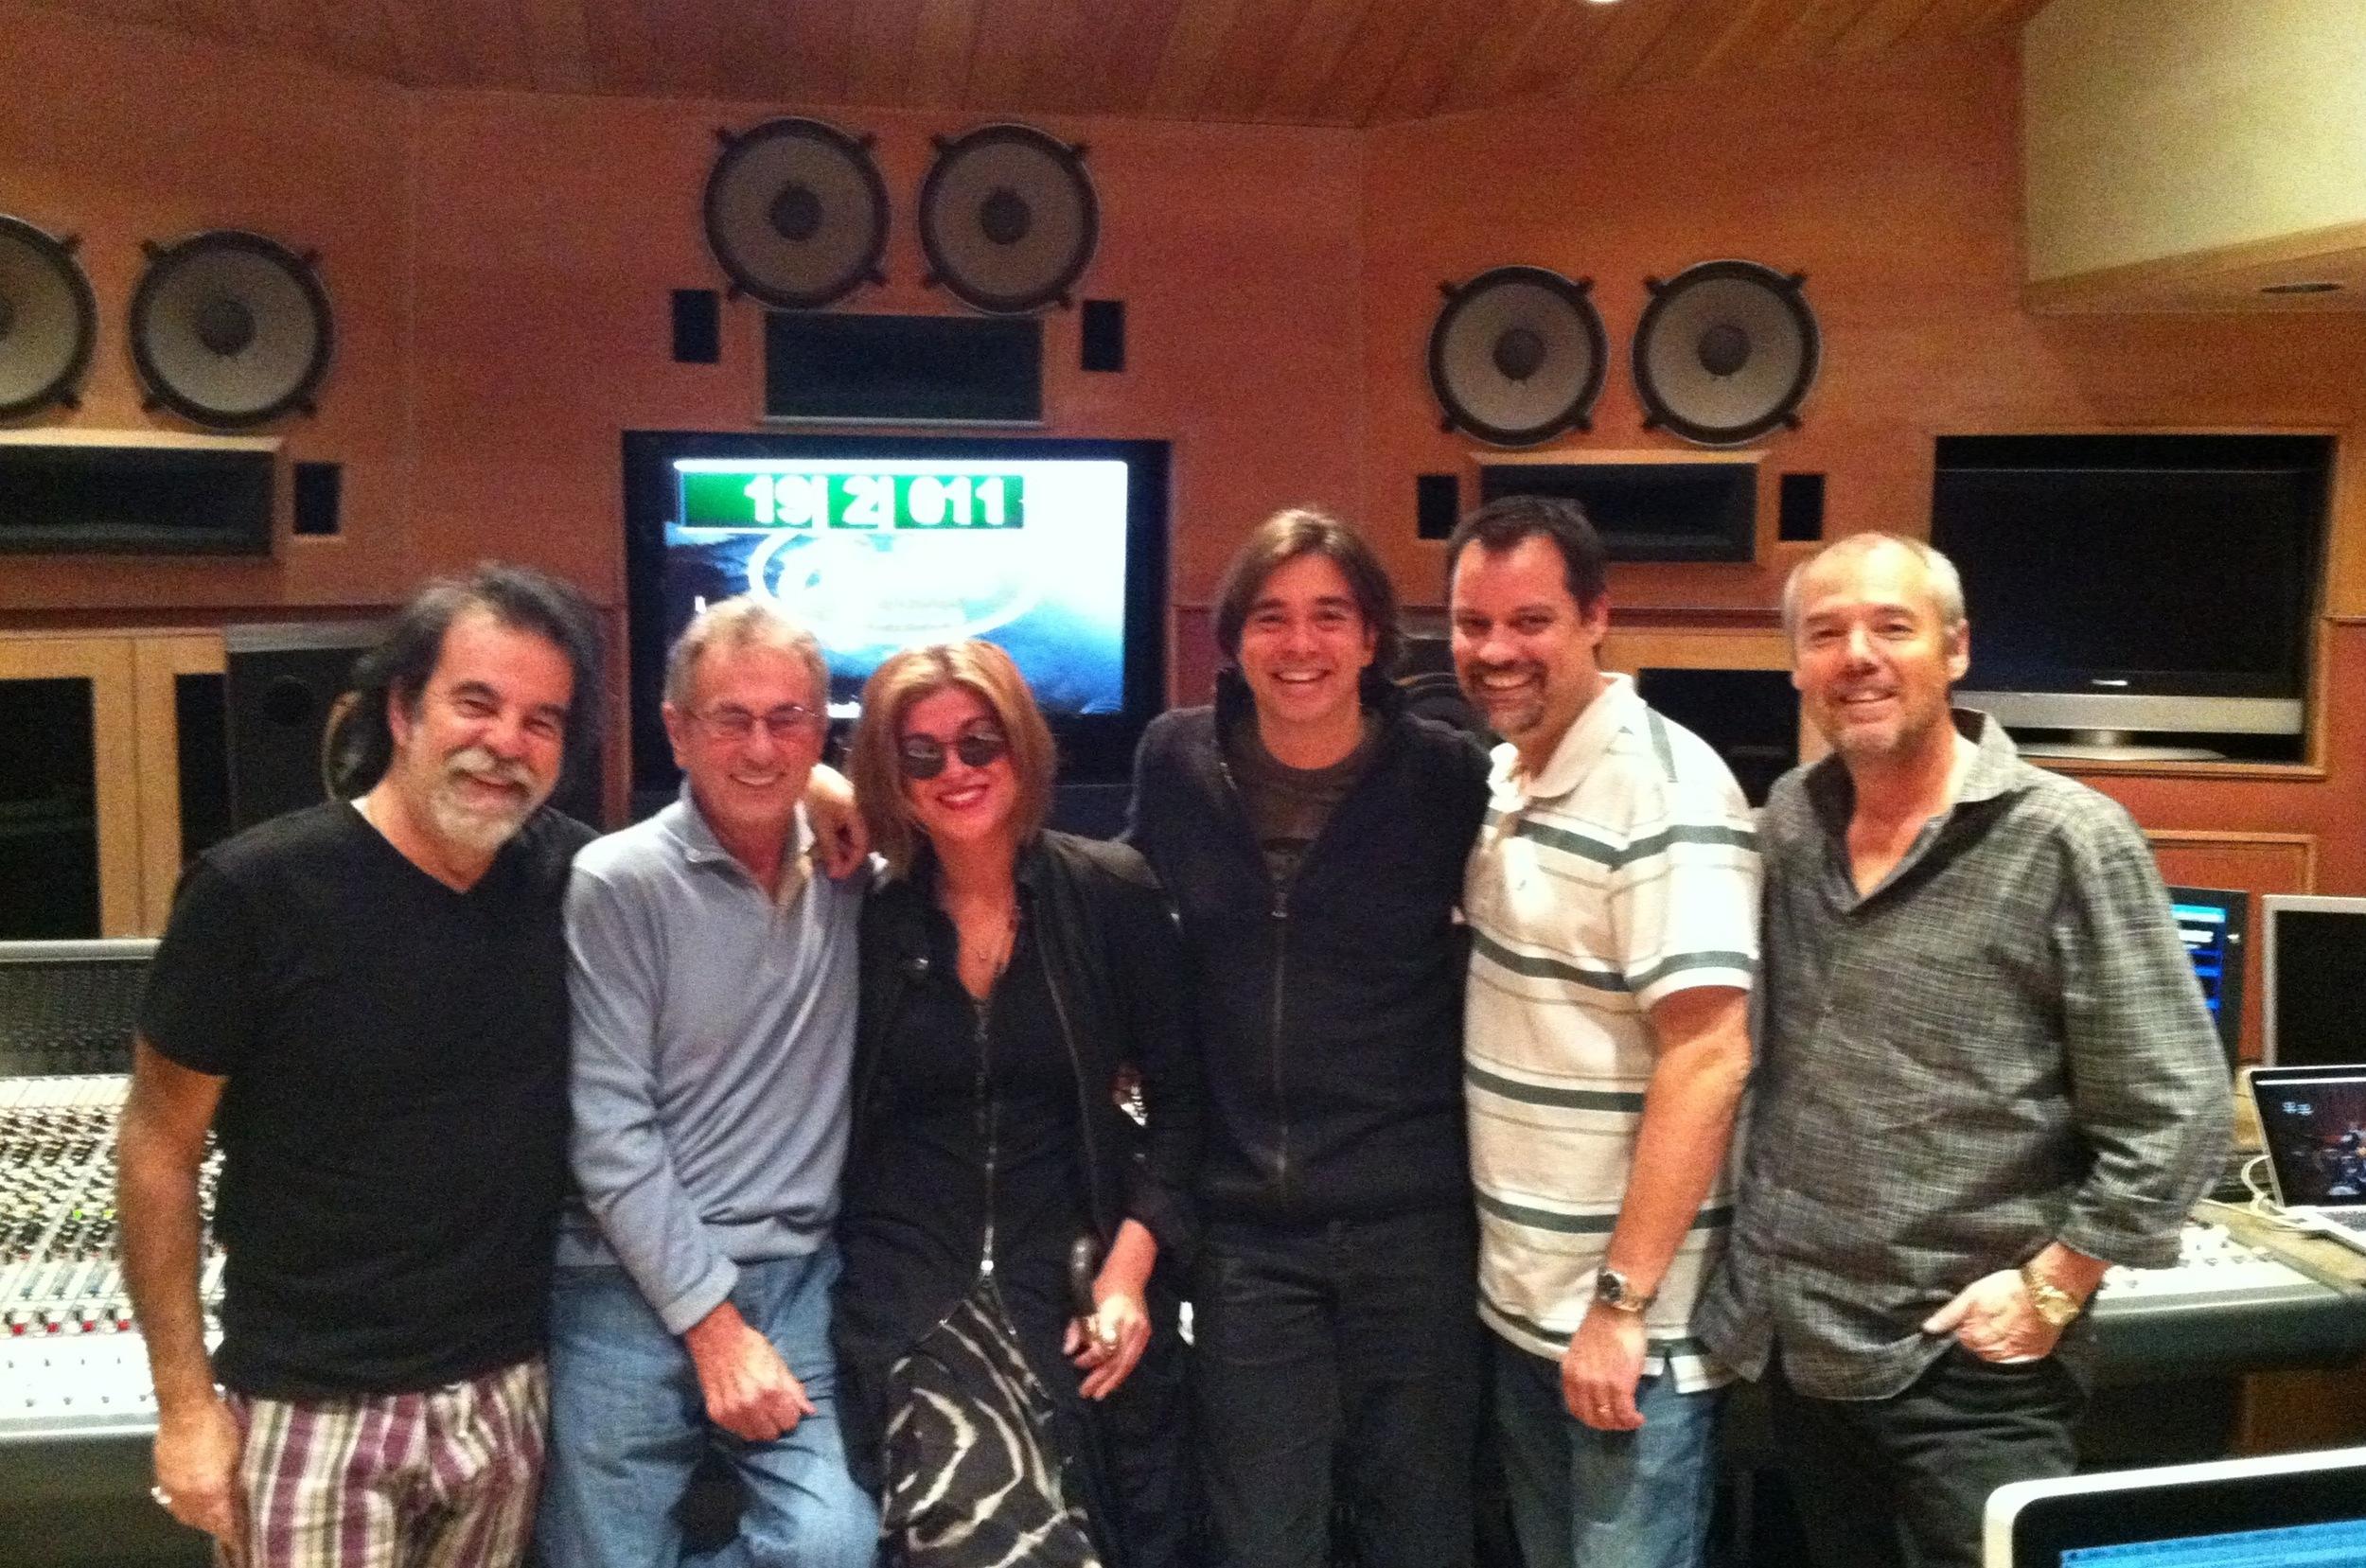 Moogie Canazio, Al Shmitt, Melody Gardot, Heitor Pierera, SG, Steve Maclam 2011